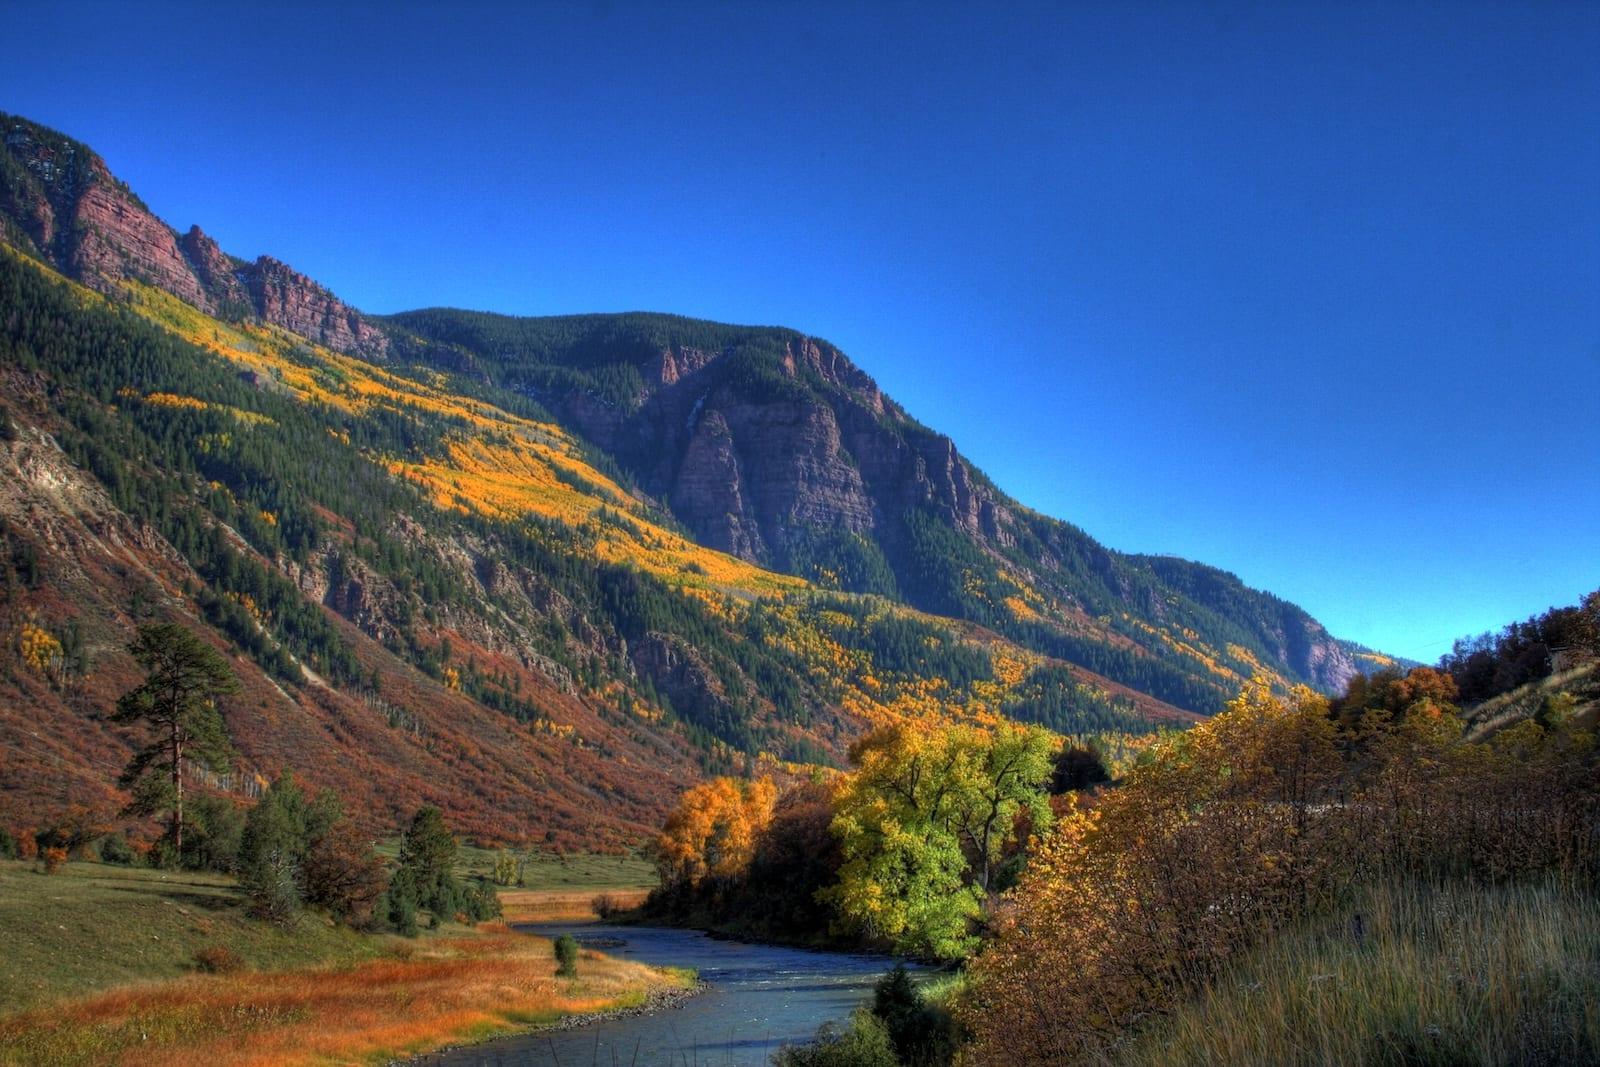 Carbondale CO Highway 133 Autumn Colors